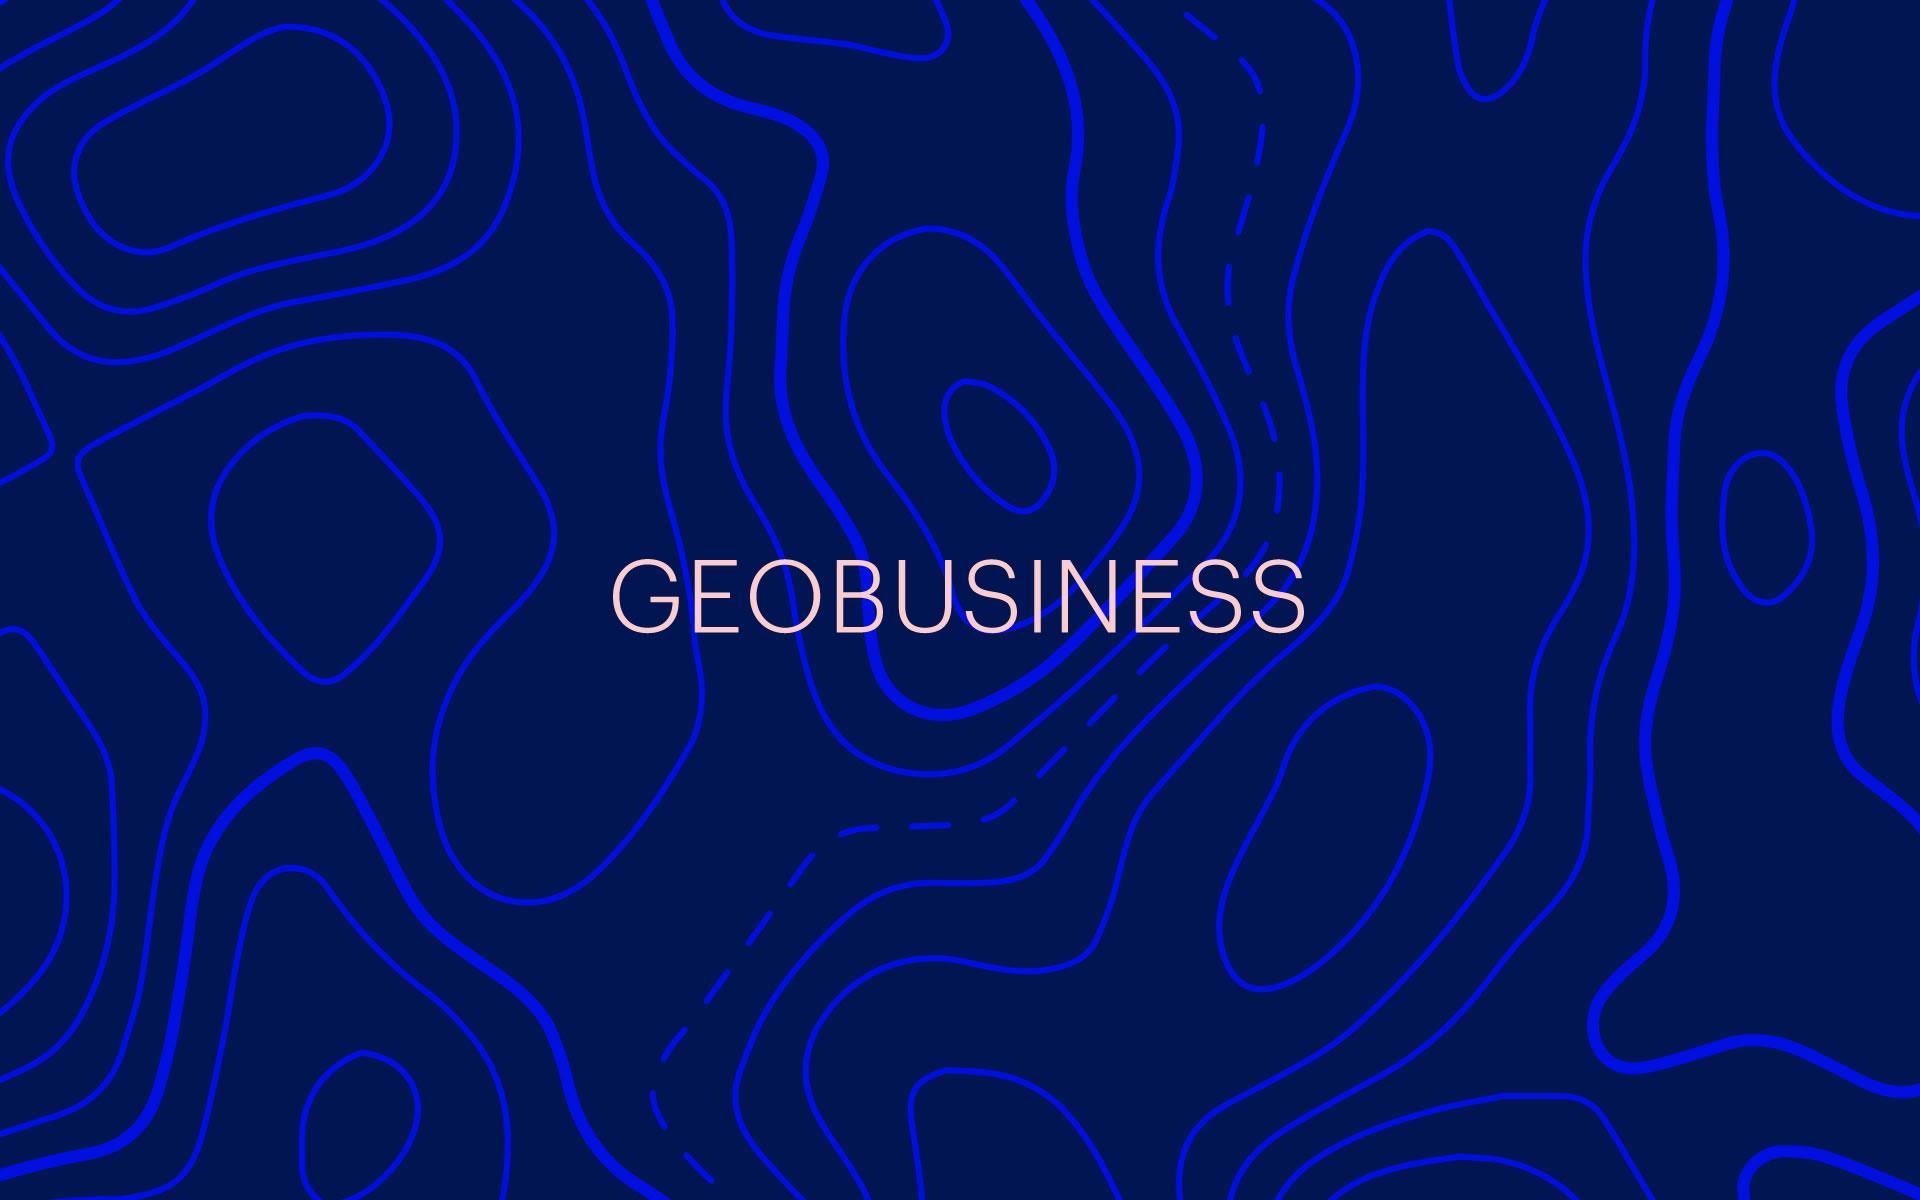 geobusiness-feat-2021-06-25